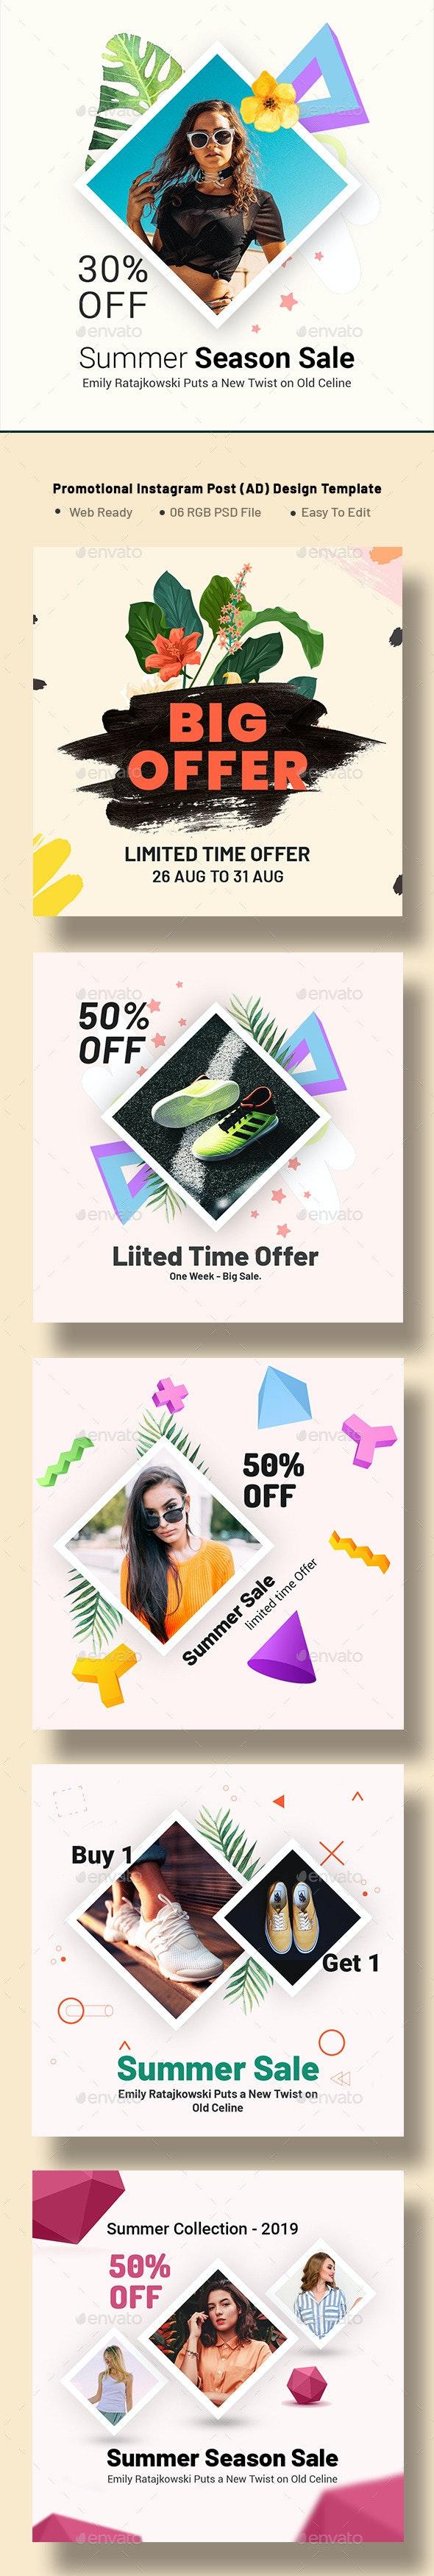 Promotional Instagram Post (AD) Design Template - Social Media Web Elements